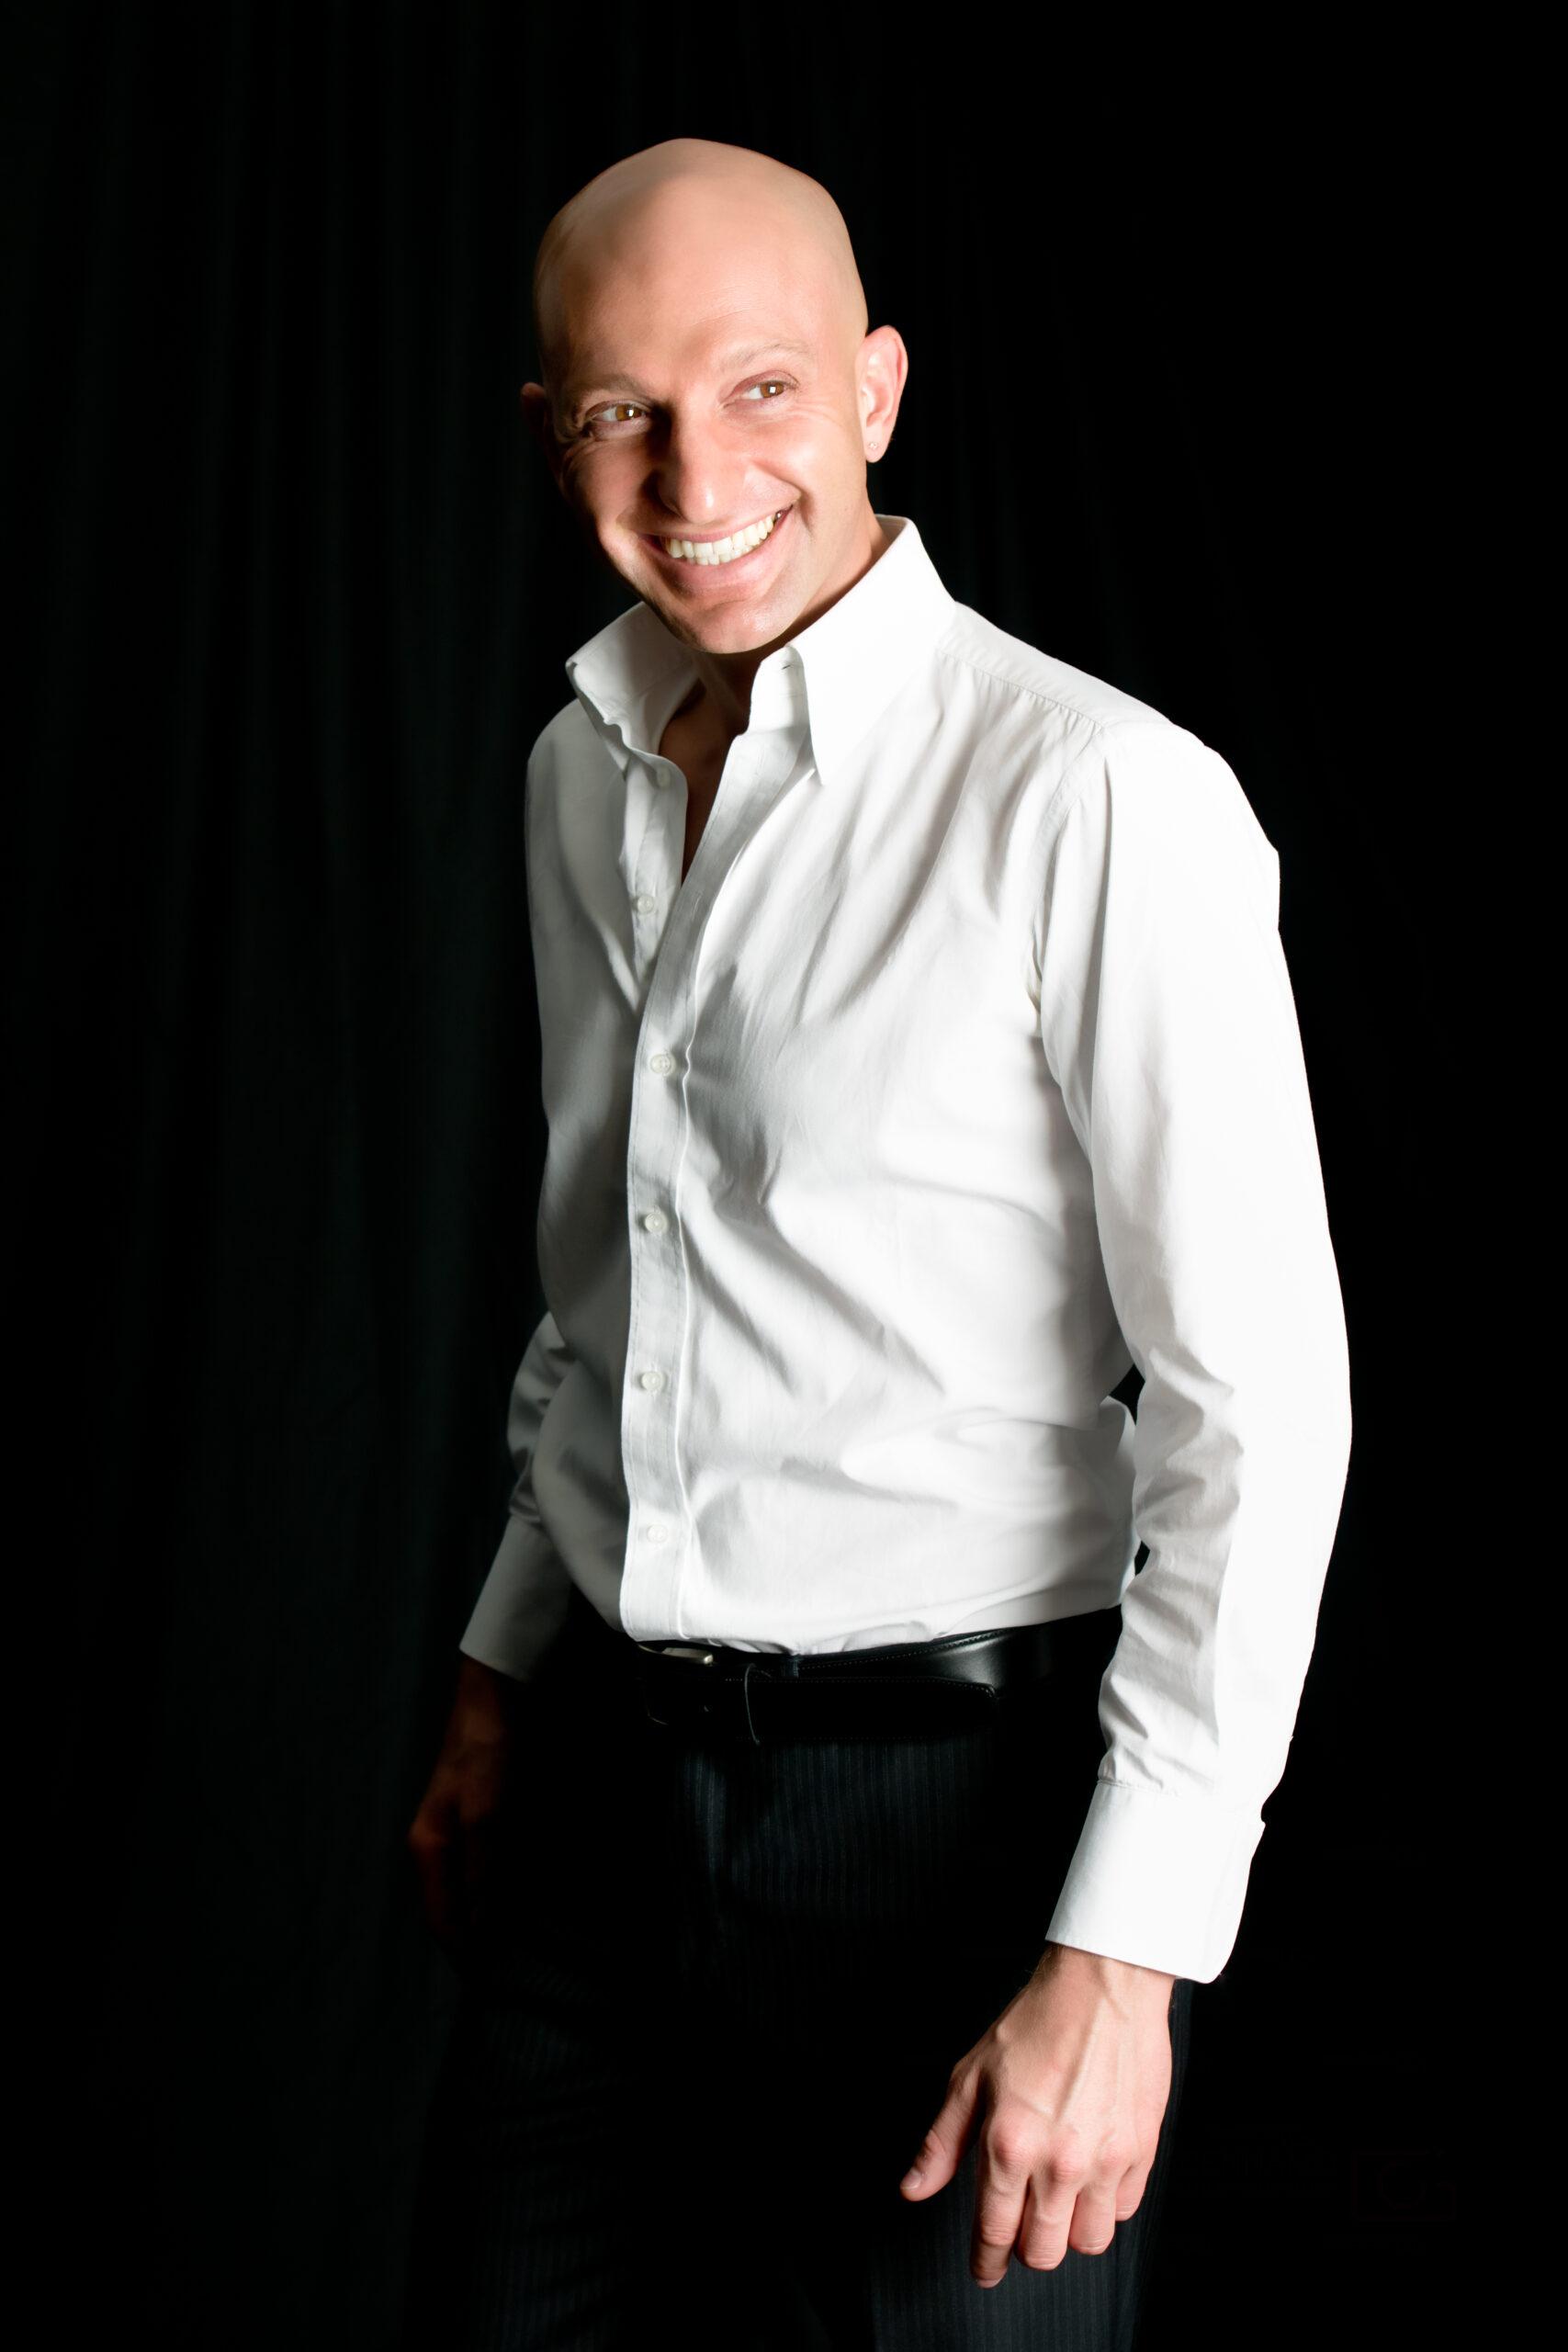 Luca Dall'Amico 140511_6036-Mod